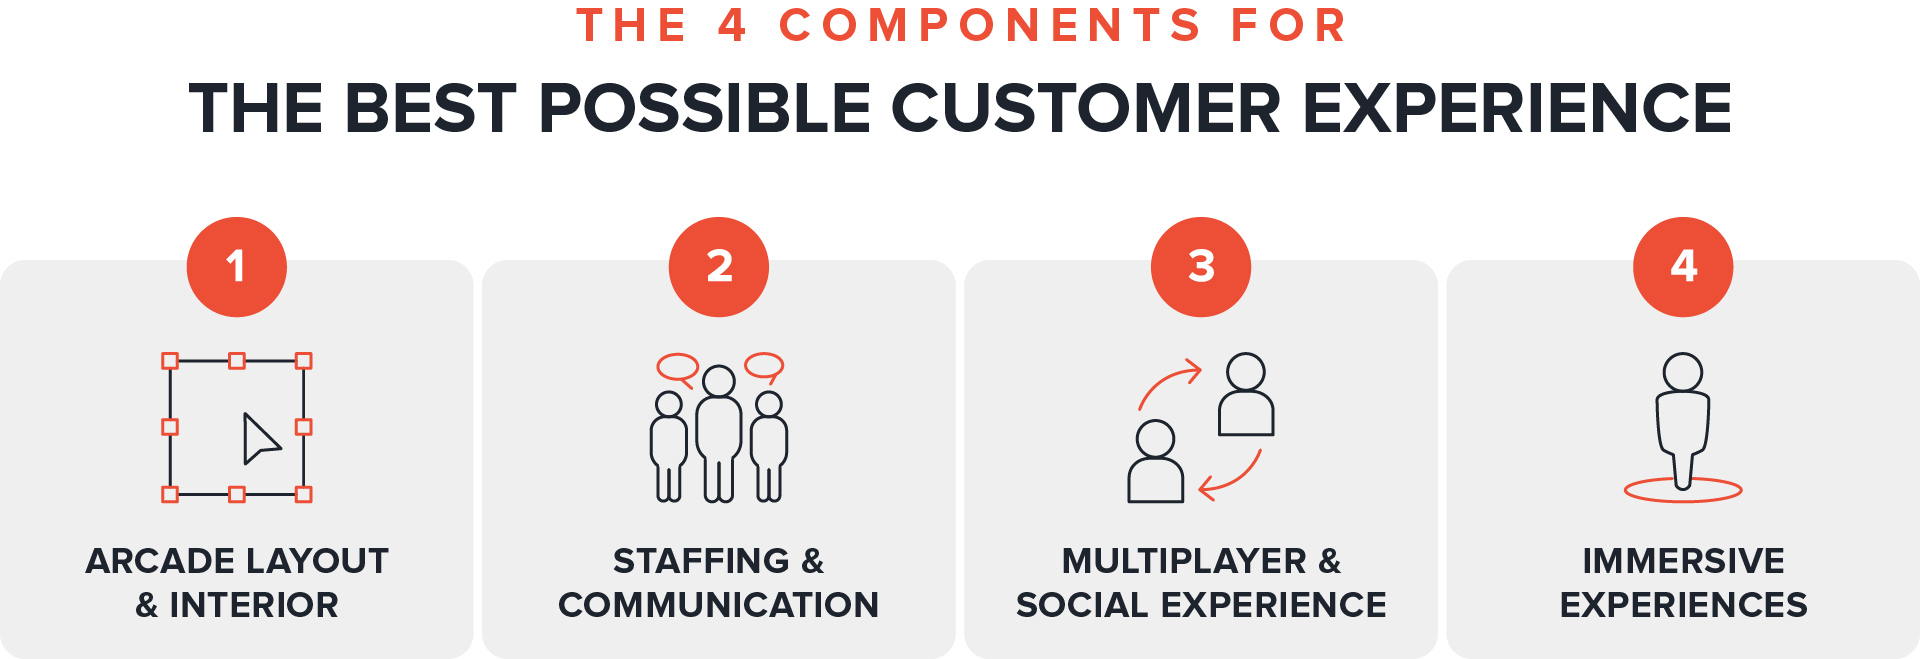 VR Arcade Open Business Plan: Customer Experience